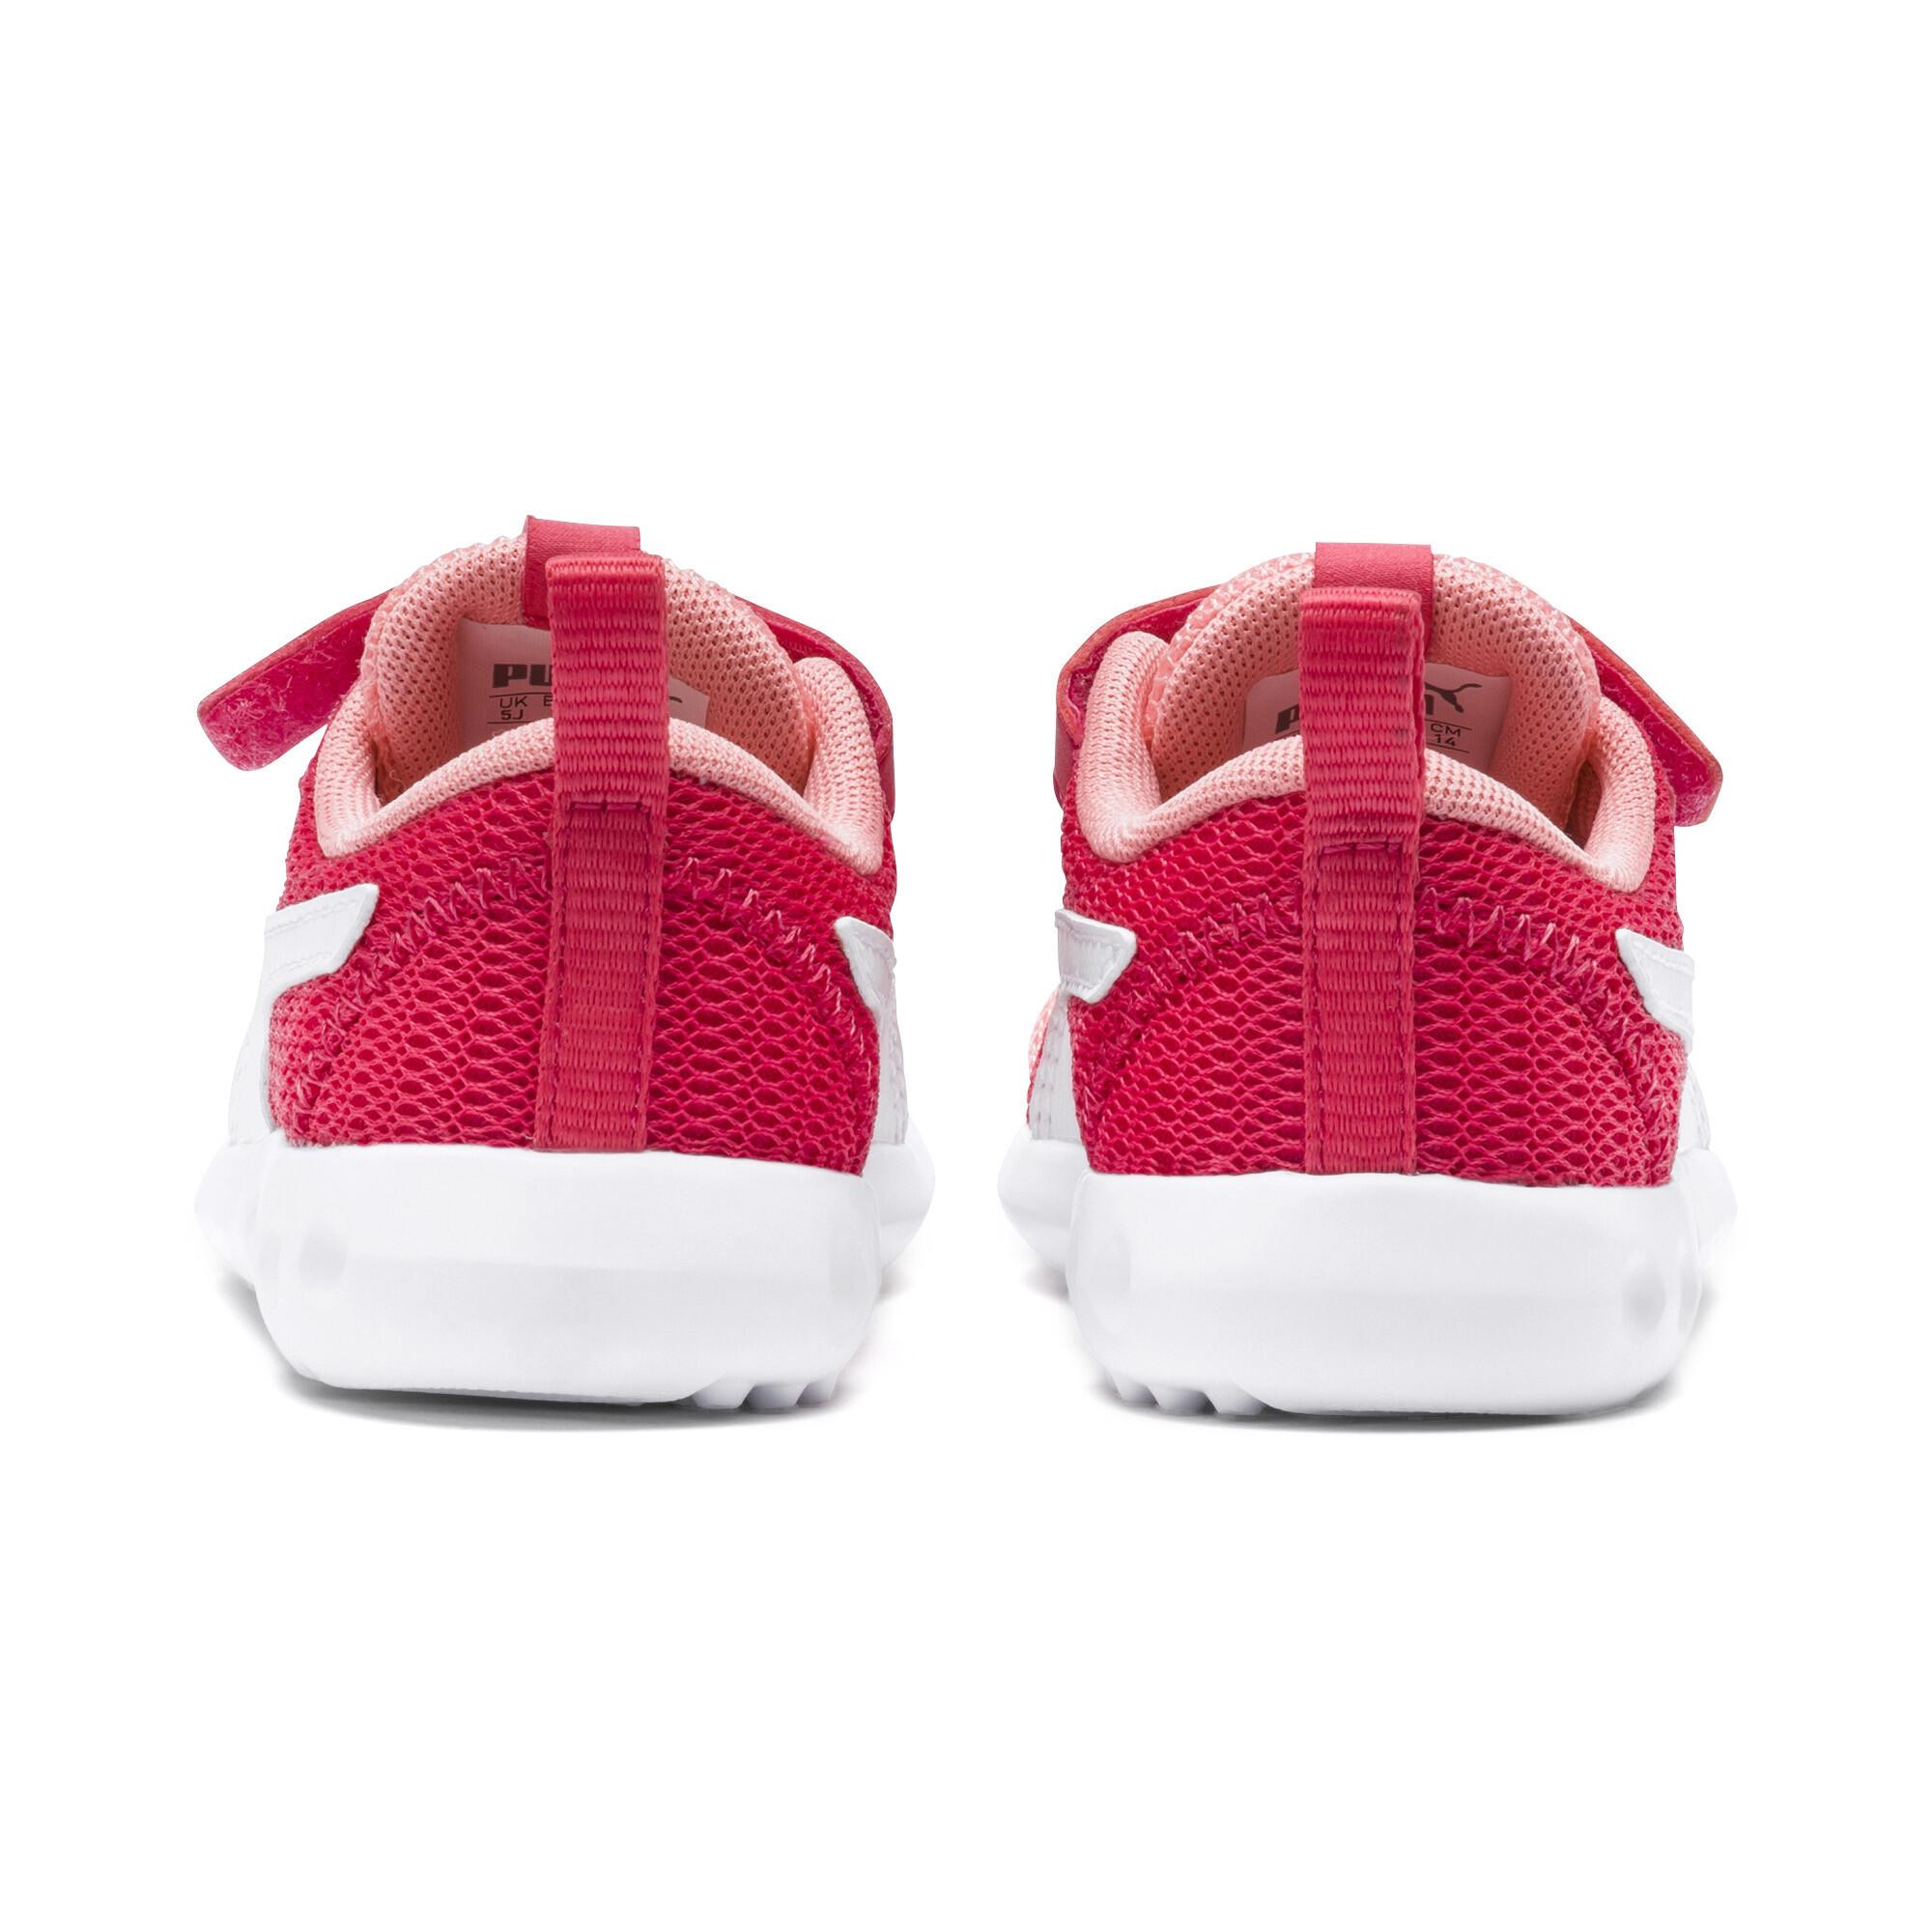 PUMA-Carson-2-Toddler-Shoes-Unisex-Shoe-Kids thumbnail 3